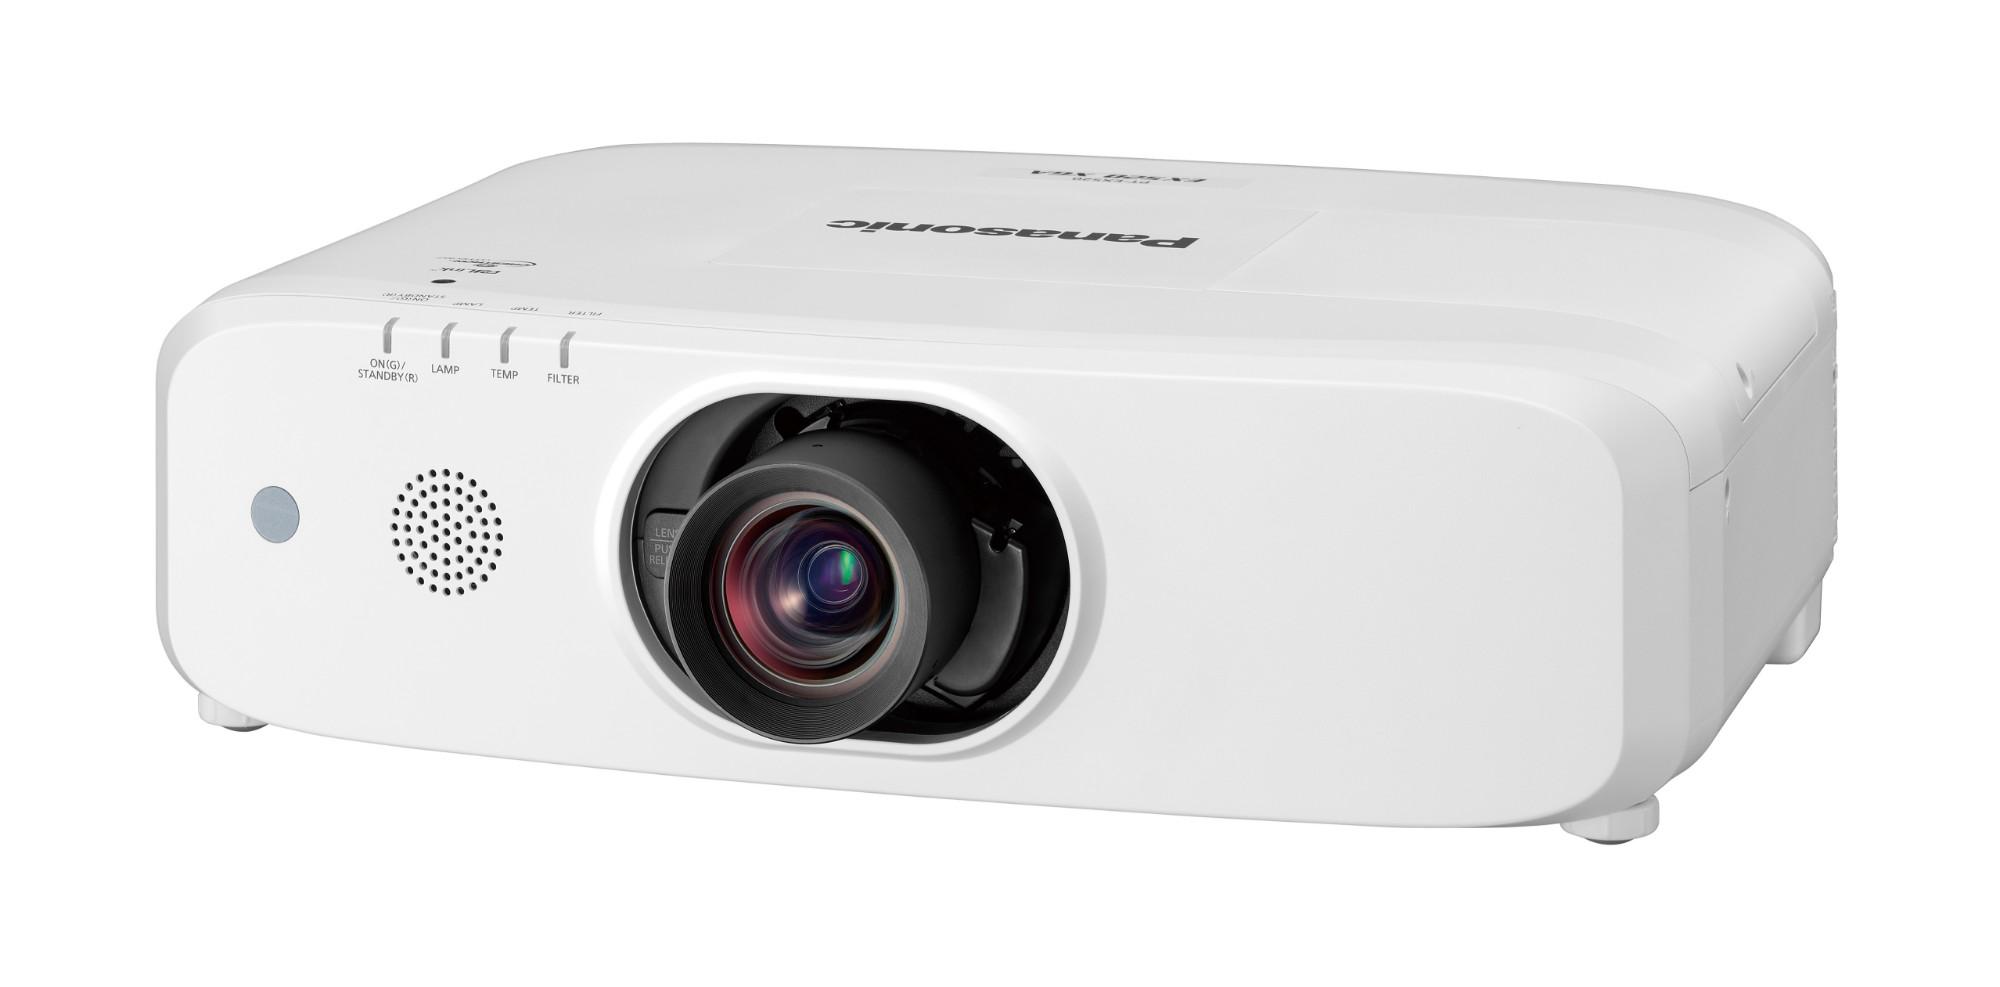 Panasonic PT-EX520LEJ data projector 5300 ANSI lumens 3LCD XGA (1024x768) Desktop projector White